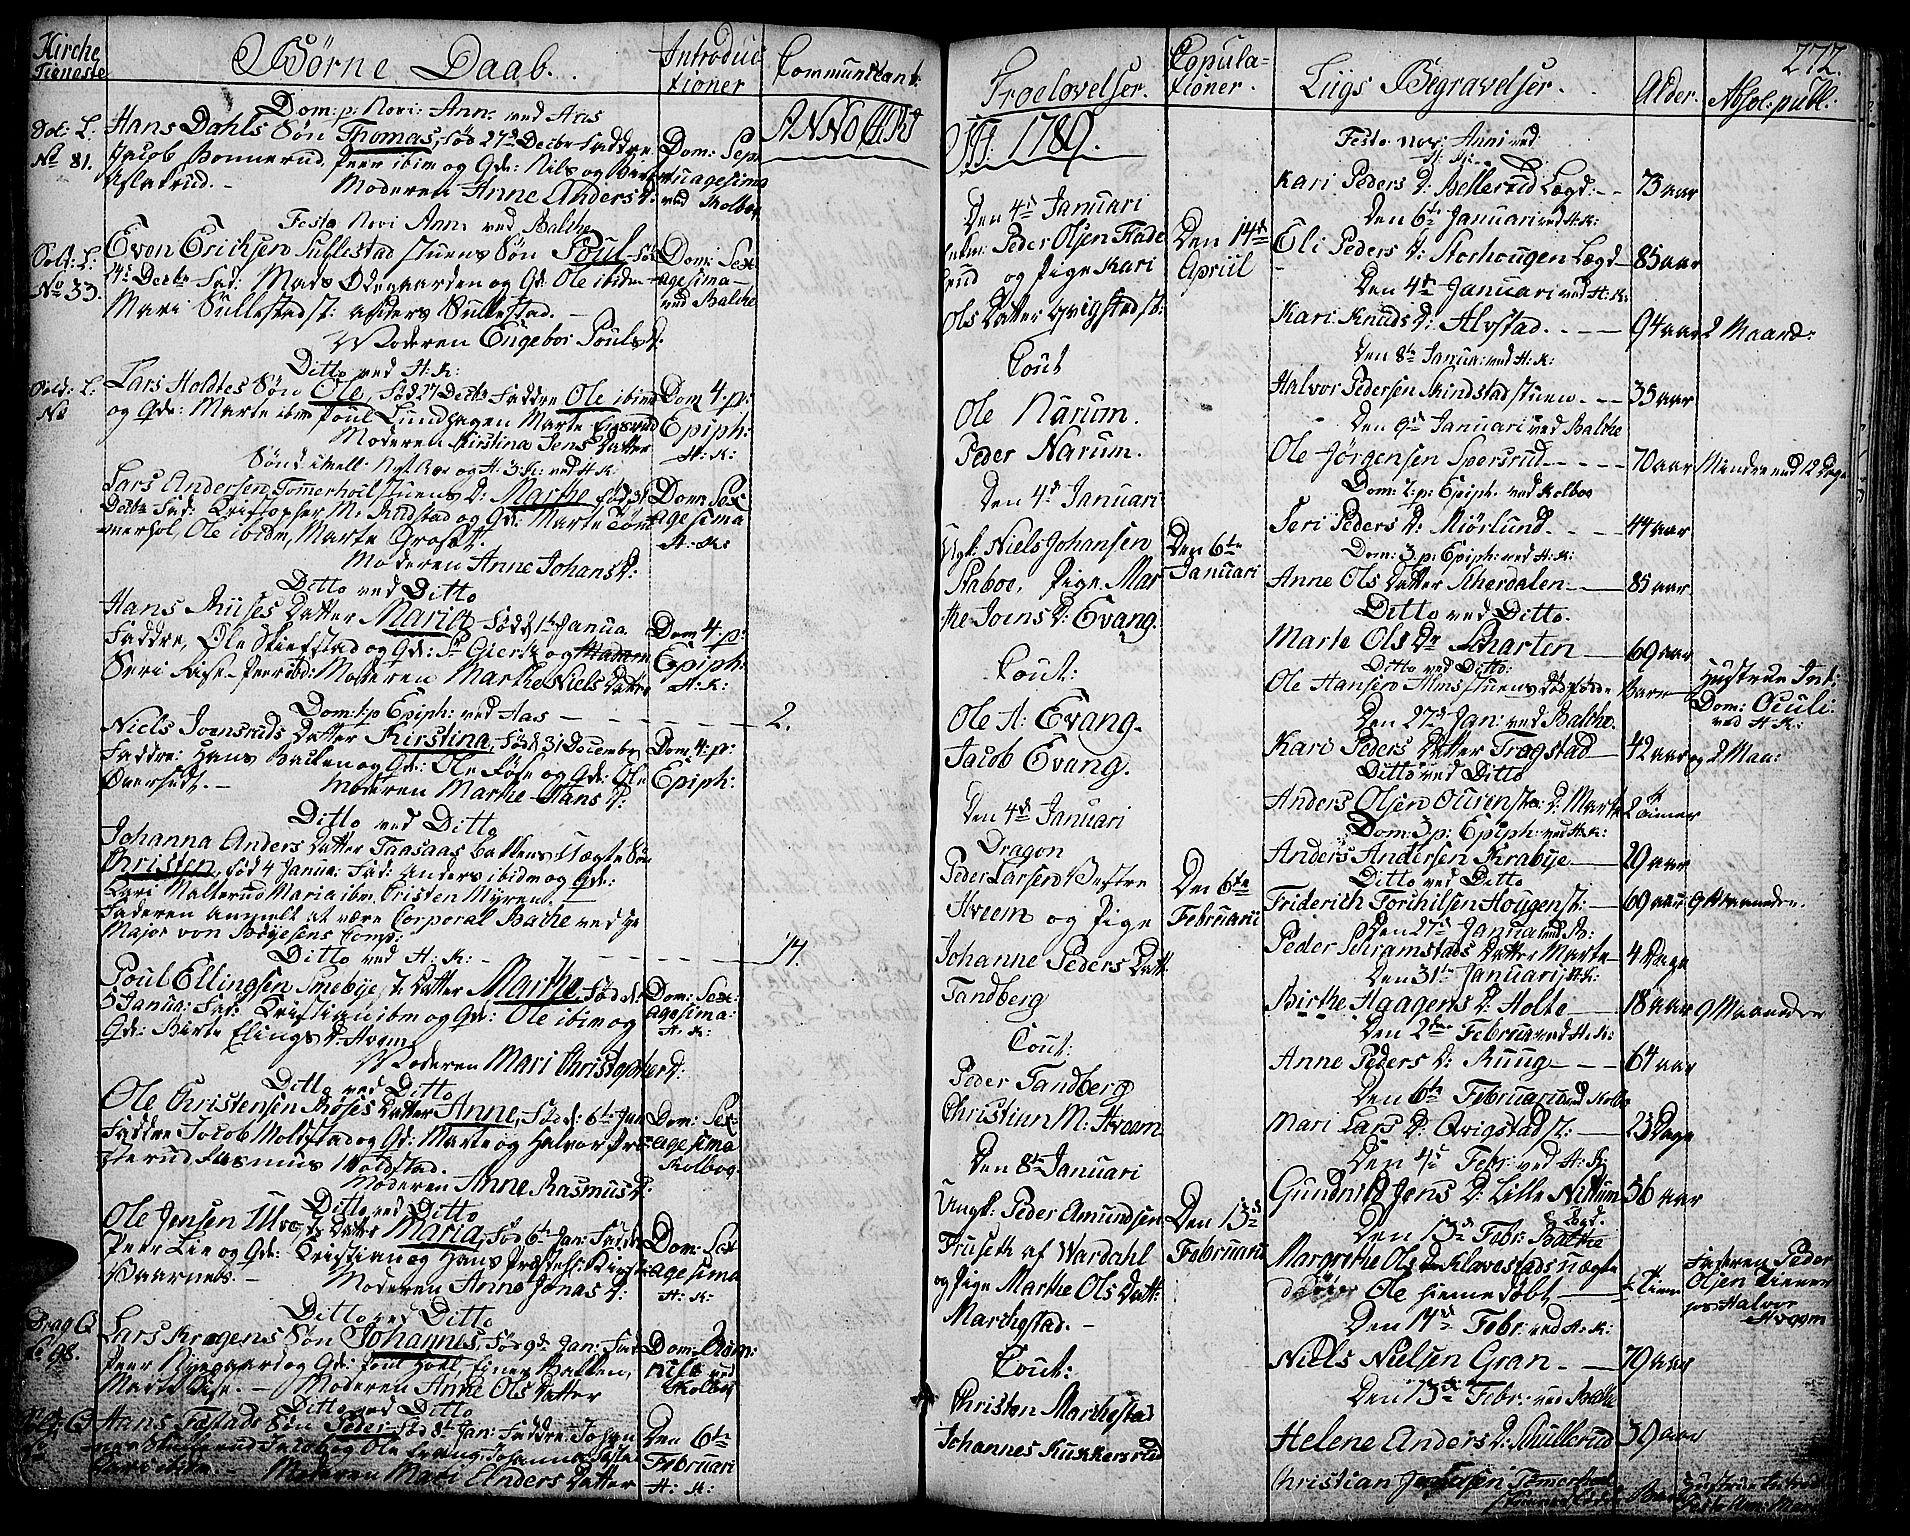 SAH, Toten prestekontor, Ministerialbok nr. 6, 1773-1793, s. 272